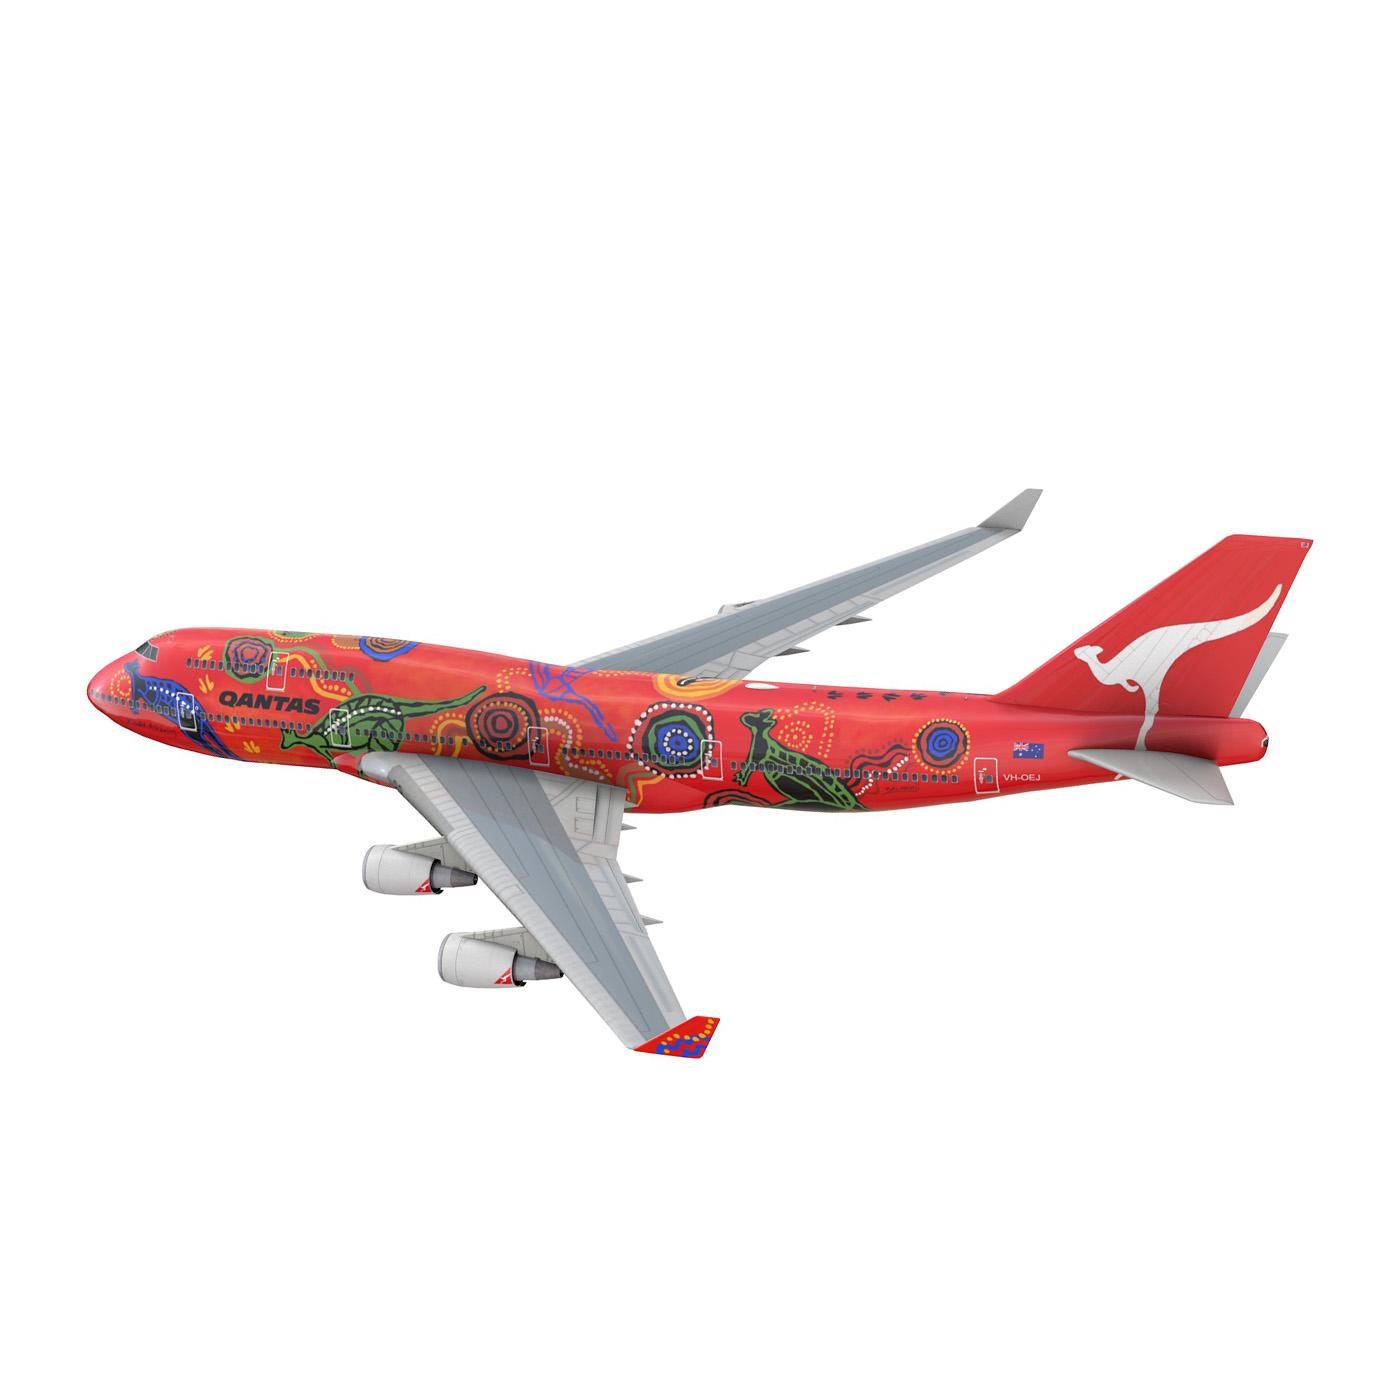 boeing 747 qantas wunala dreaming 3d model 3ds fbx c4d lwo obj 281784